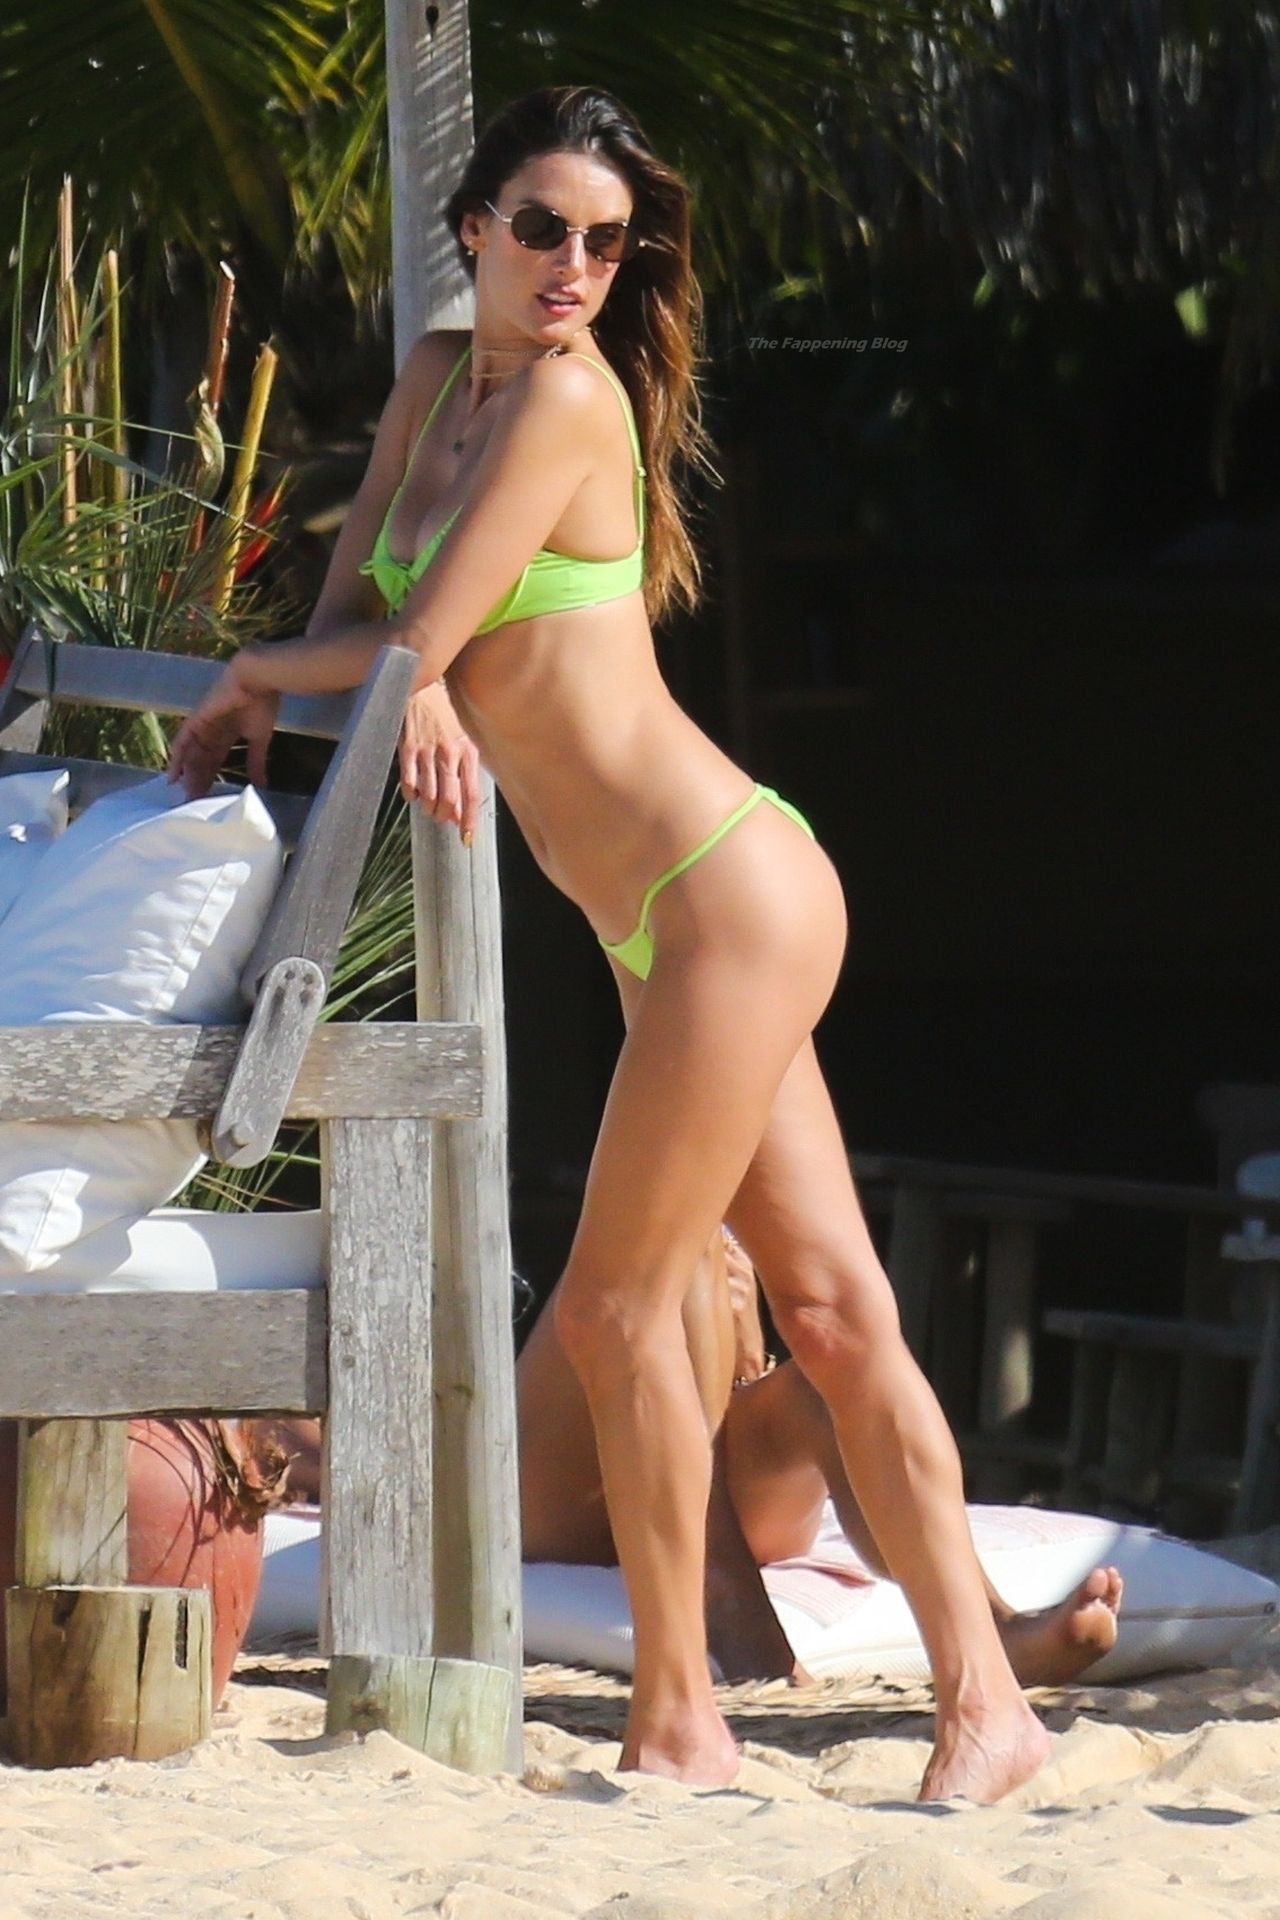 Alessandra-Ambrosio-Sexy-The-Fappening-Blog-671.jpg